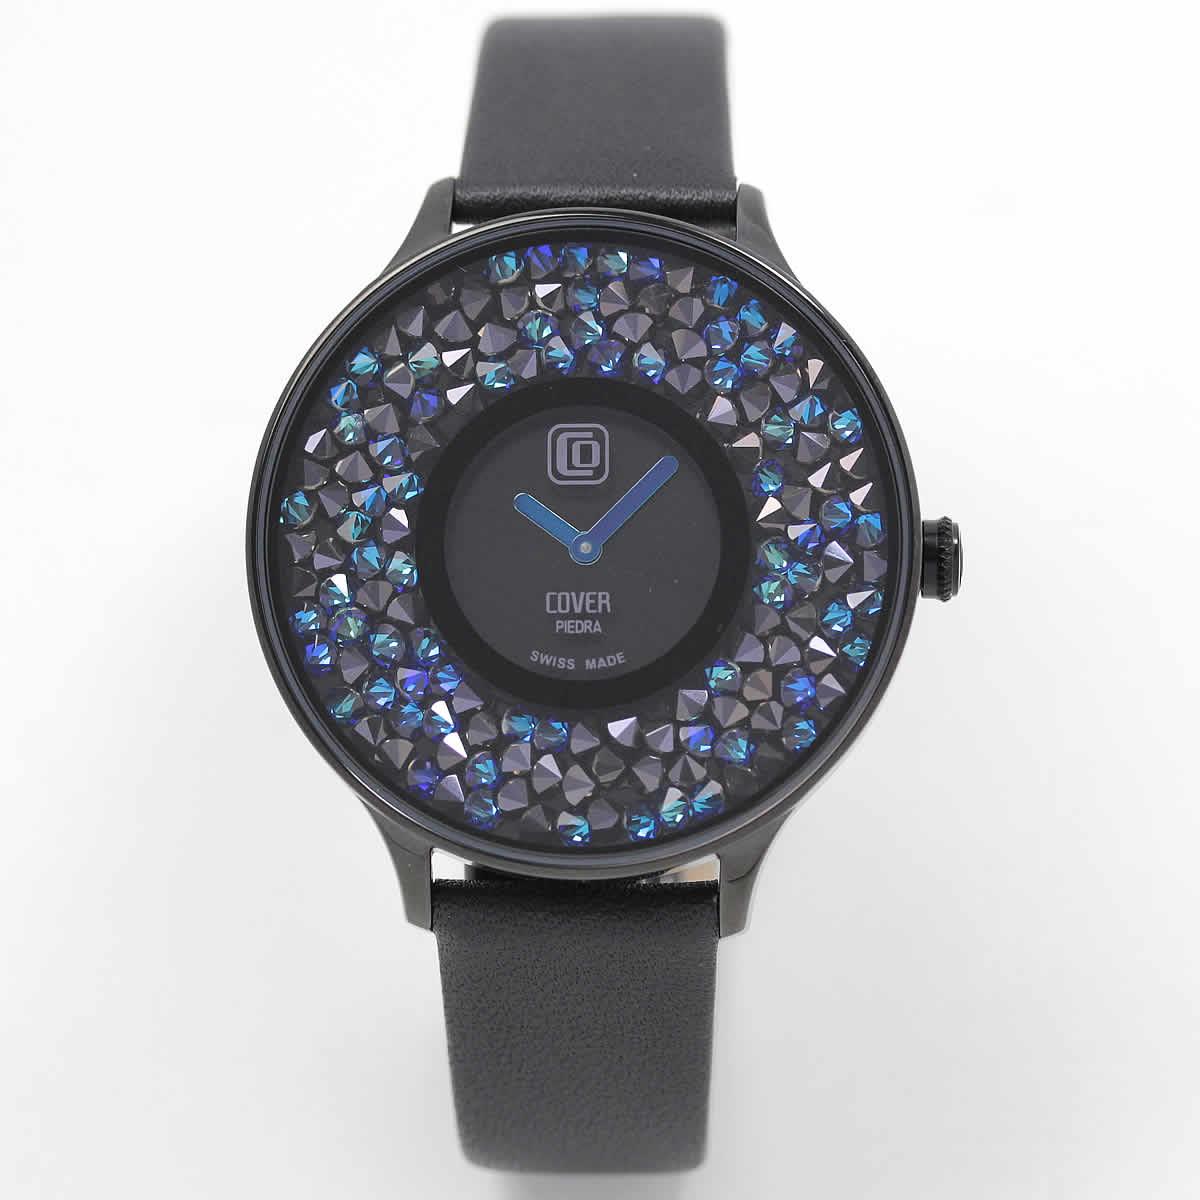 COVER(コヴァ) TREND PIEDRA Co158.04 ブラック 女性用腕時計